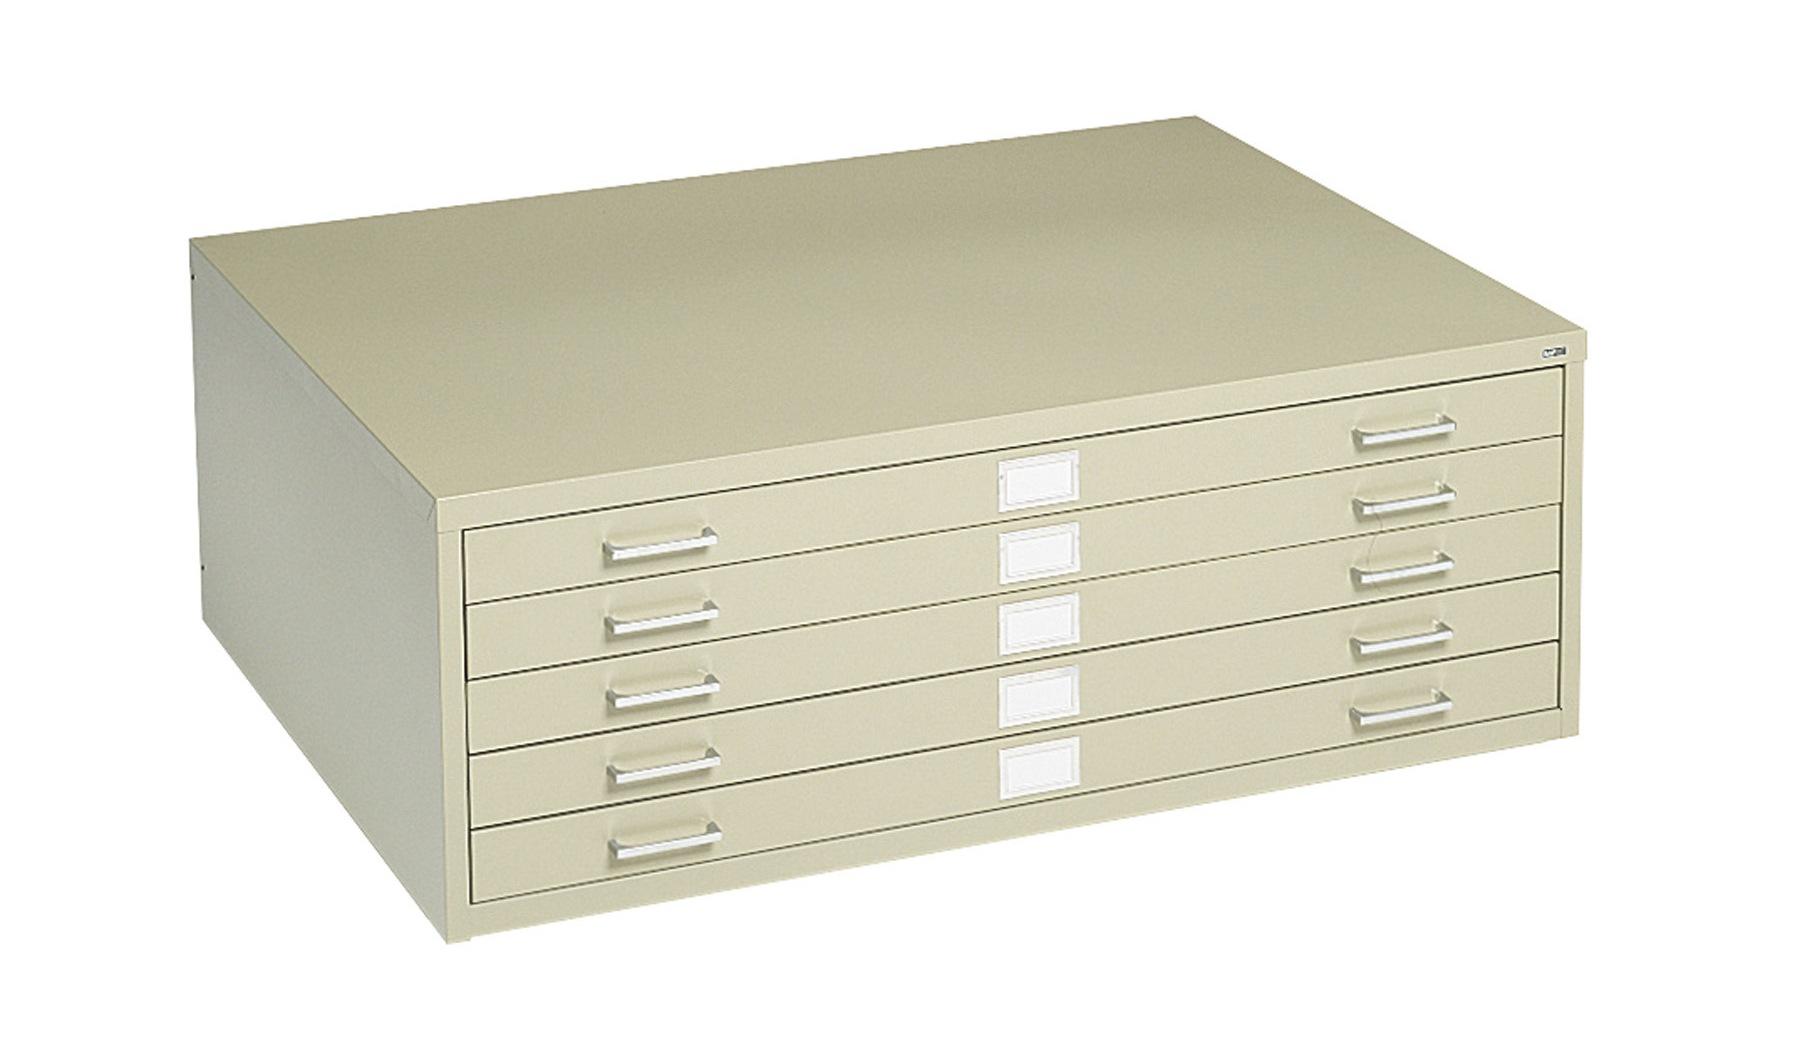 Flat File Coffee Table Flat File Coffee Table At 1stdibs  : flat file coffee table 07 from amlibgroup.com size 1800 x 1047 jpeg 192kB